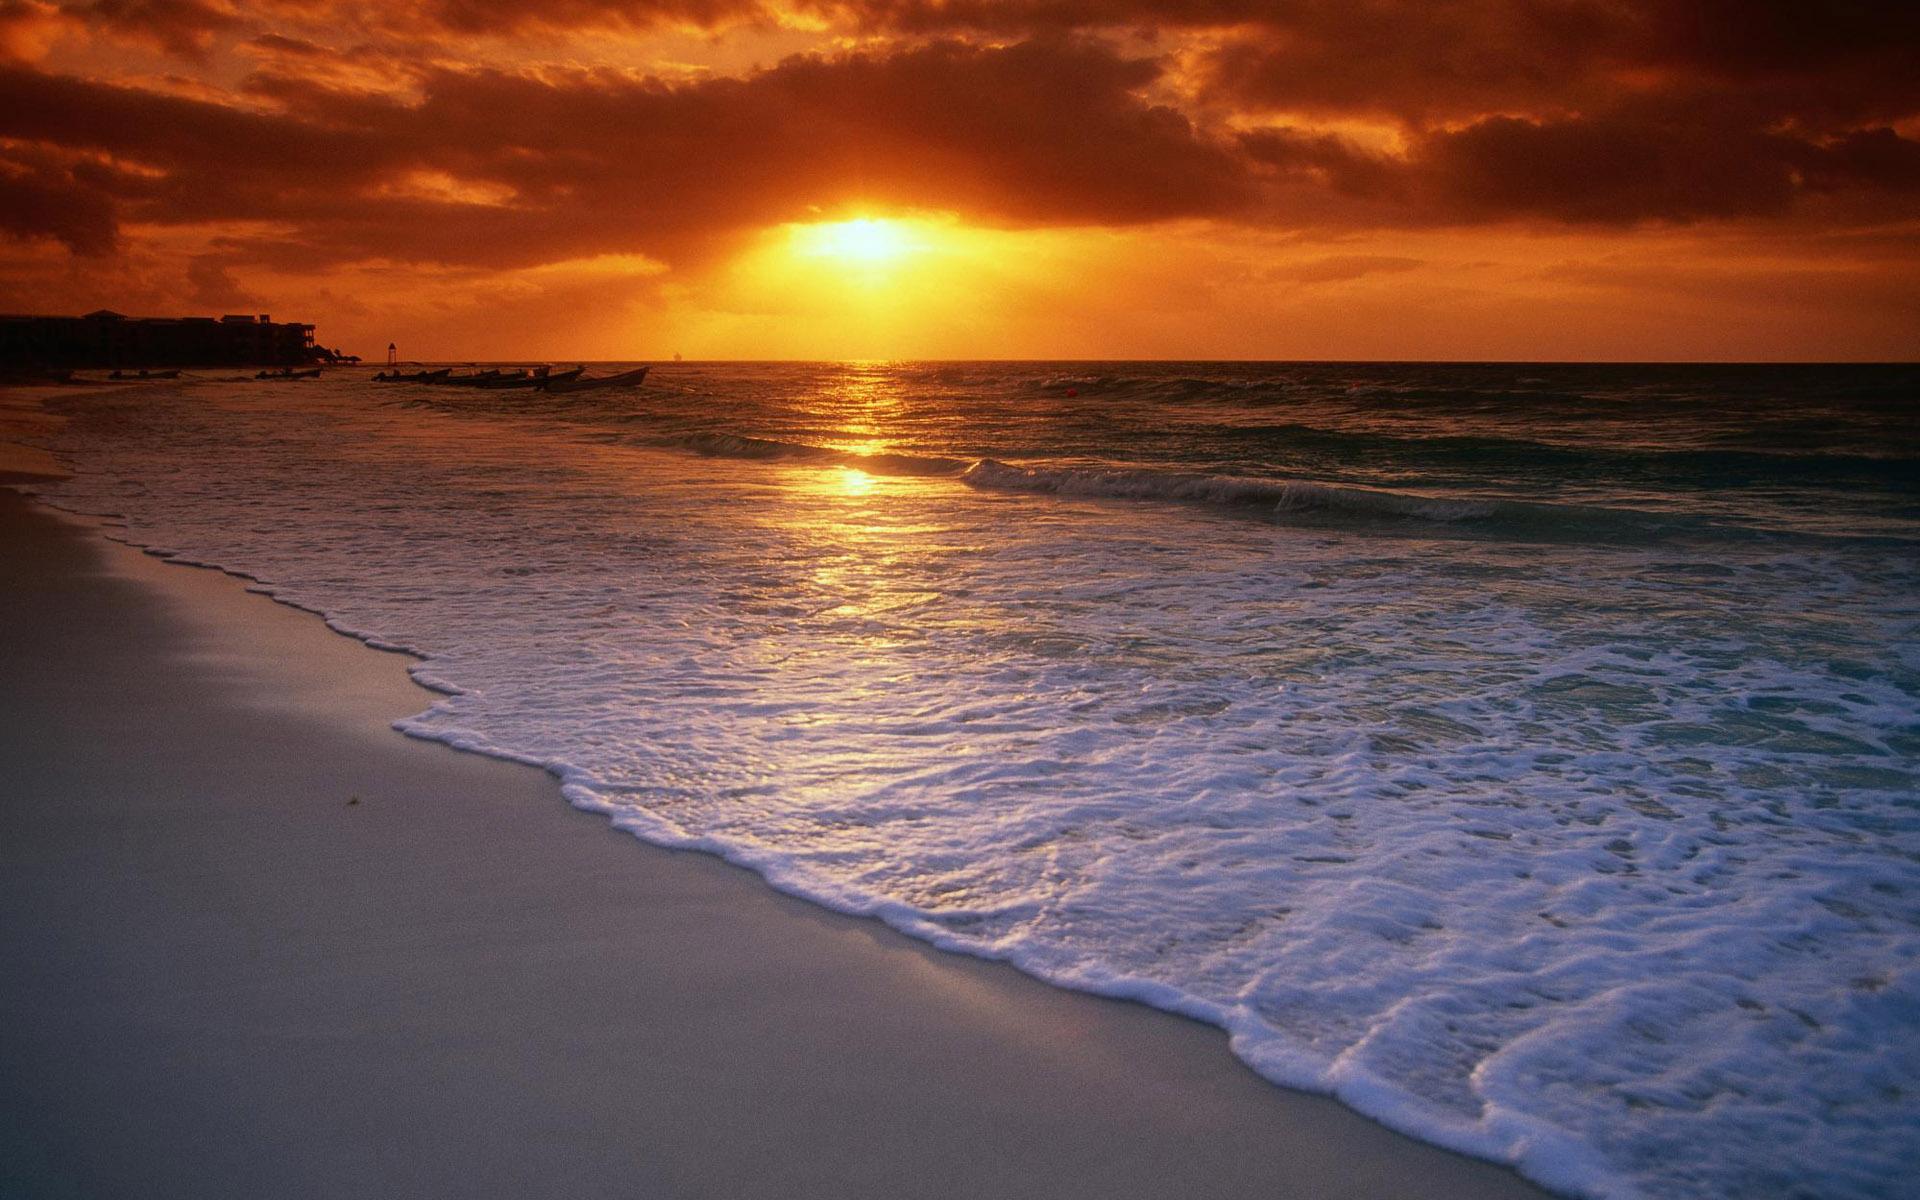 Sunset On The Beach Wallpaper Cool #vm0at8xu – Yoanu